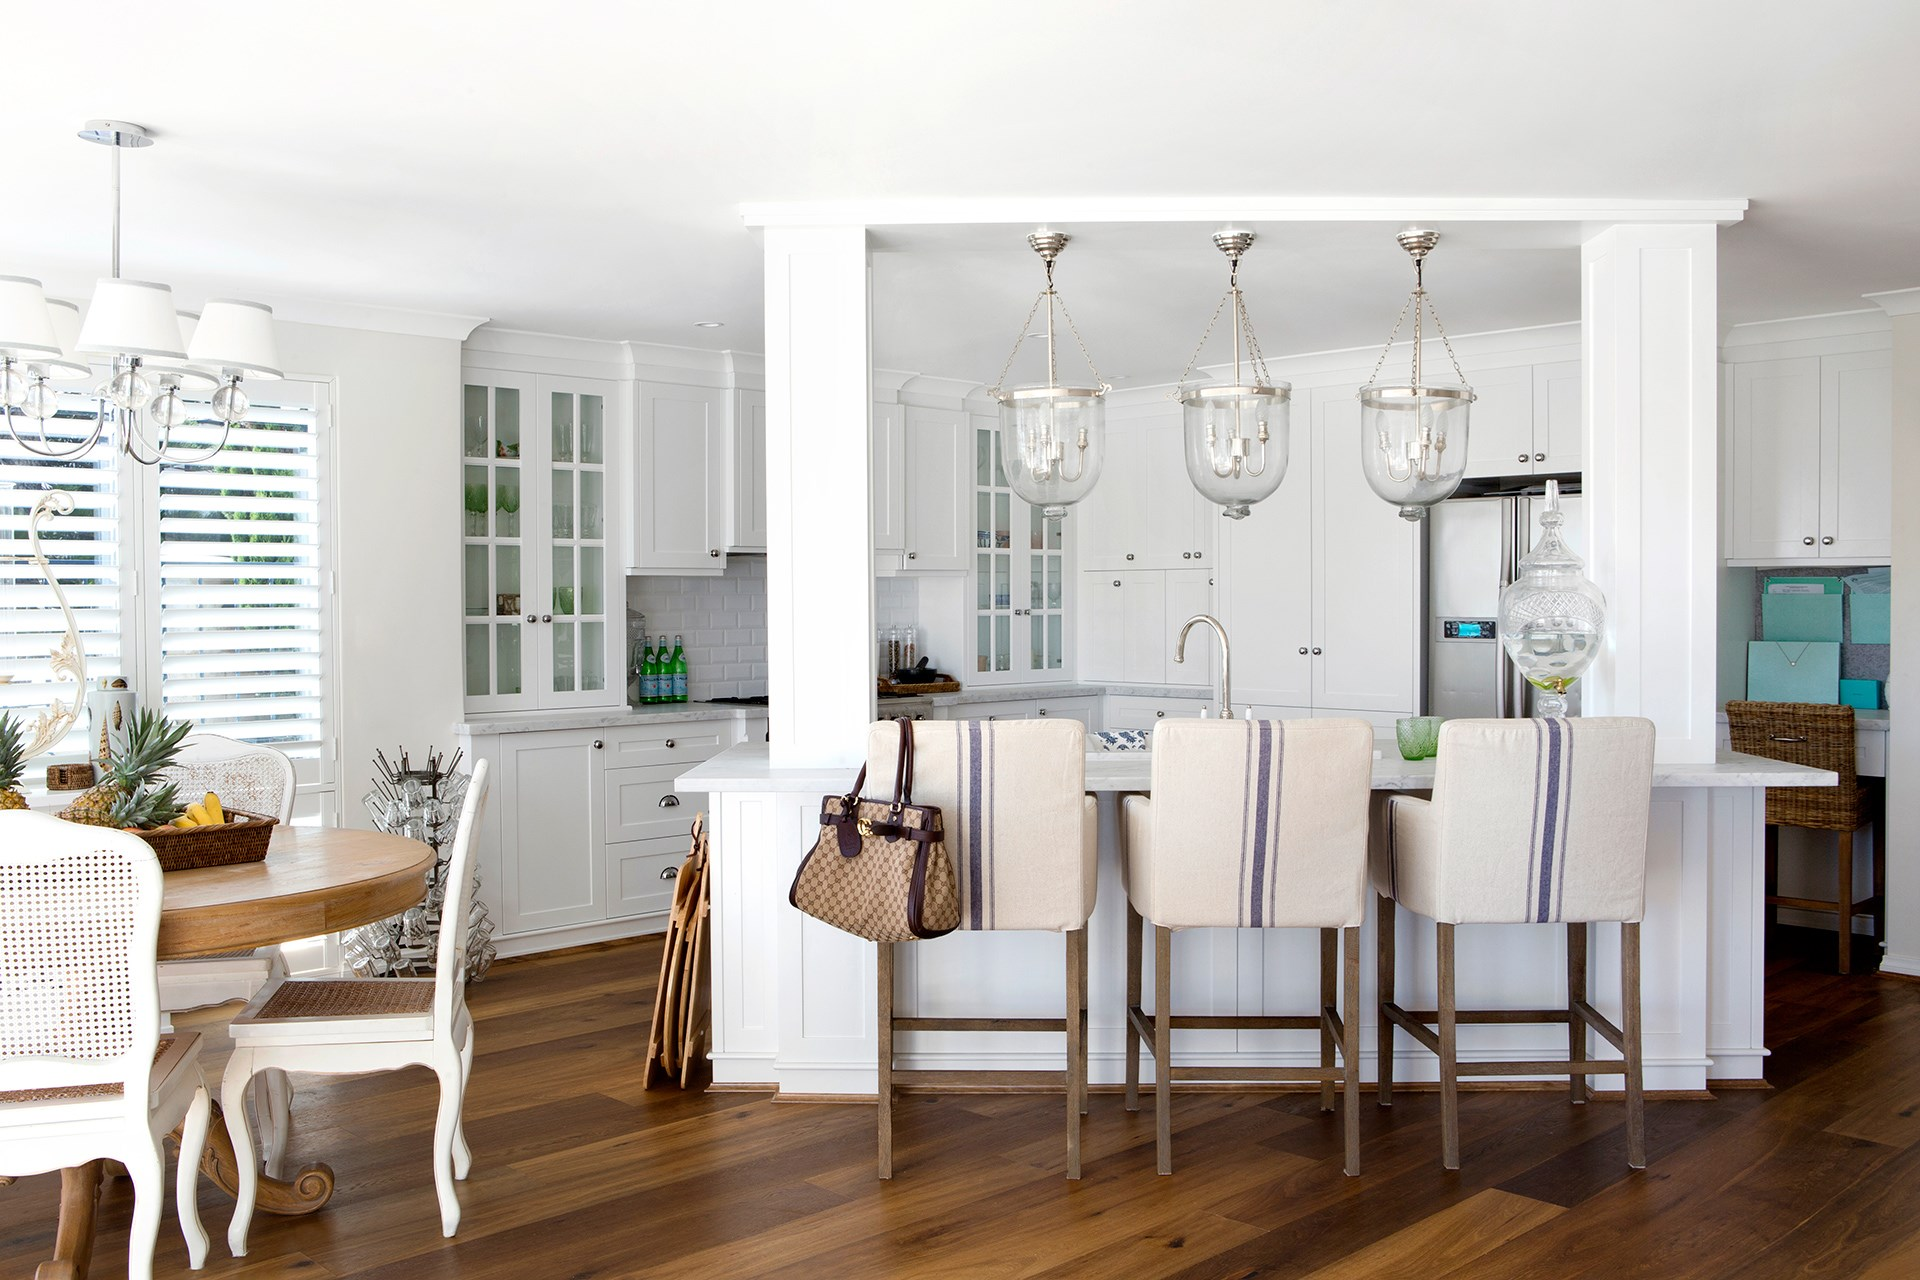 10 Coastal Kitchen Design Ideas | Homes To Love